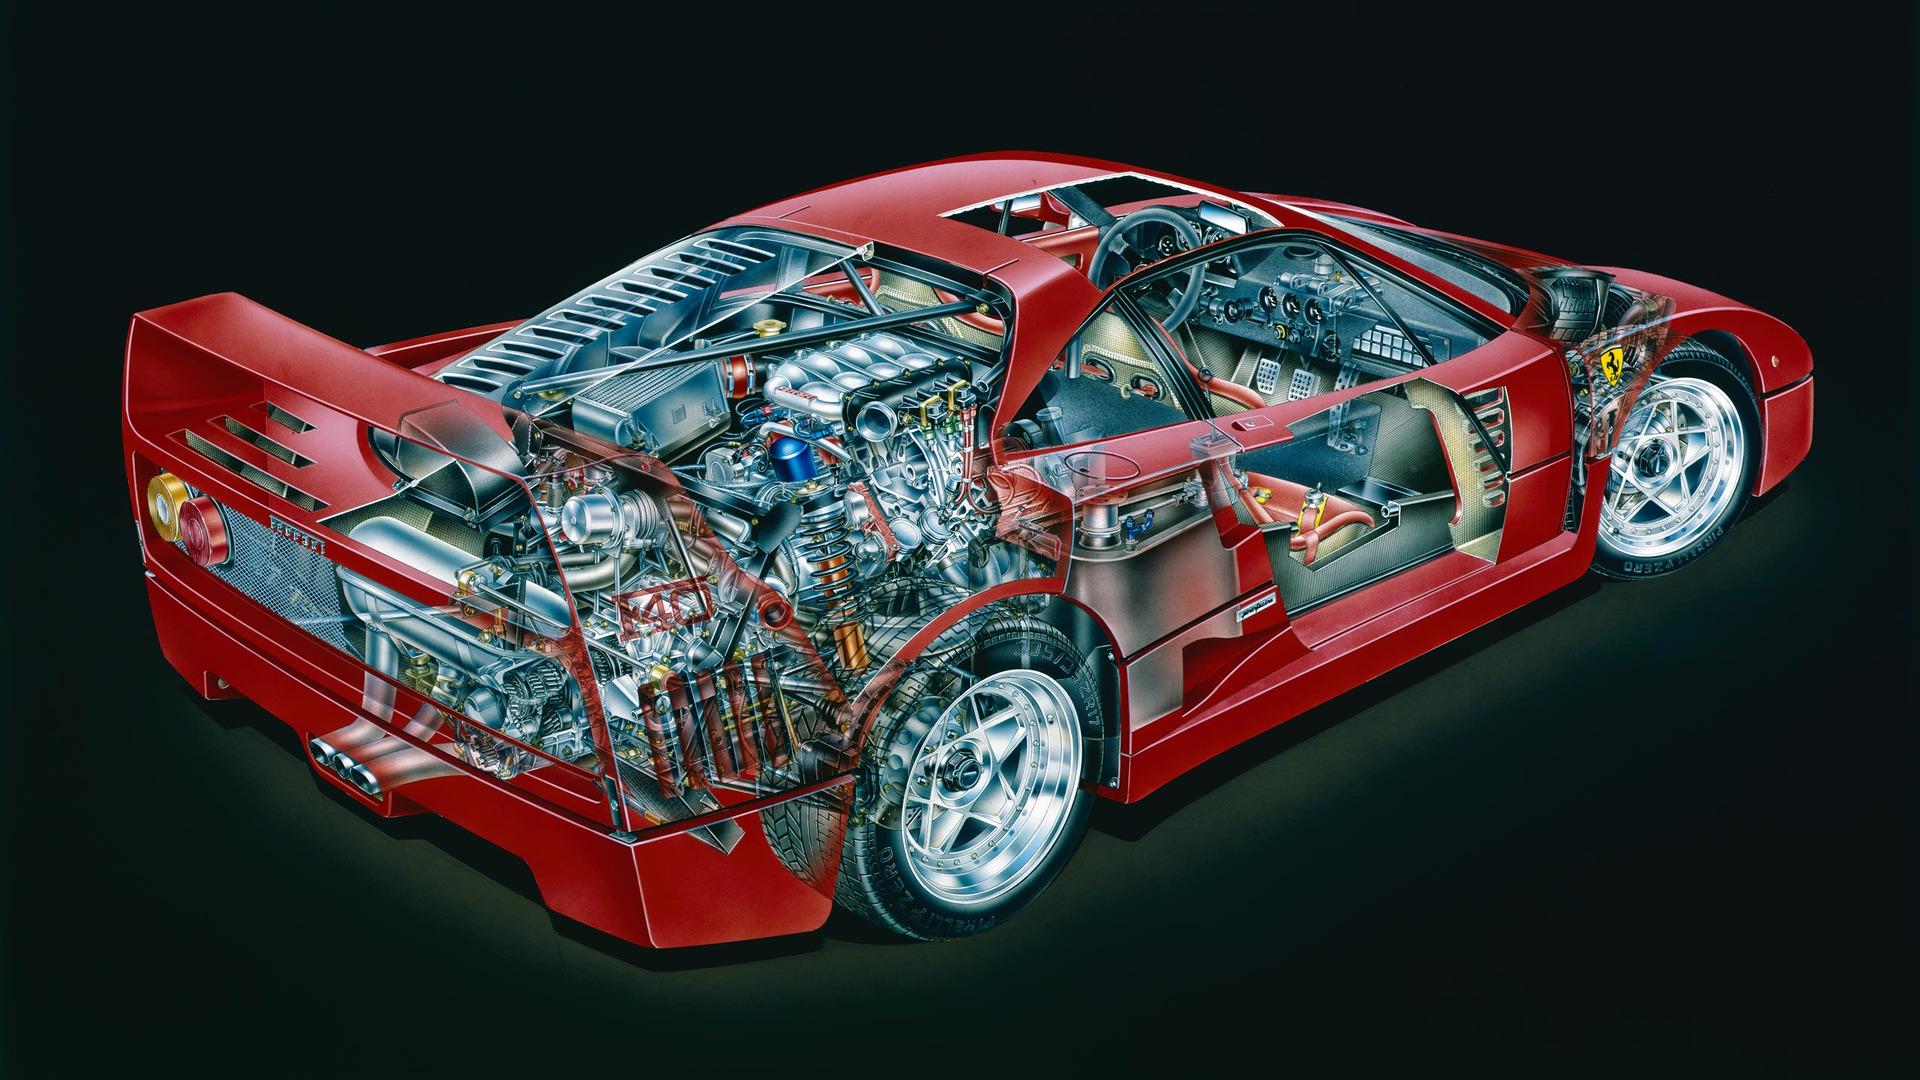 Ferrari F40 For Sale >> 6 Ferrari F40 facts for car nerds only